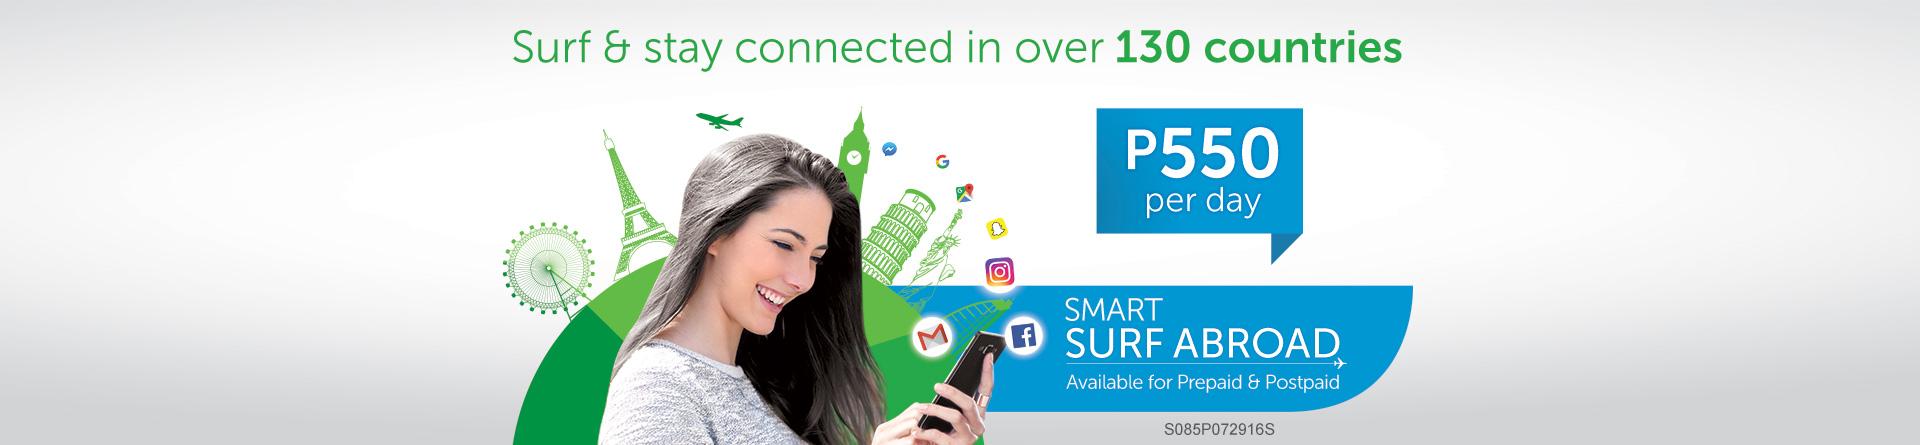 Prepaid Surf Abroad - Smart International - Smart Communications